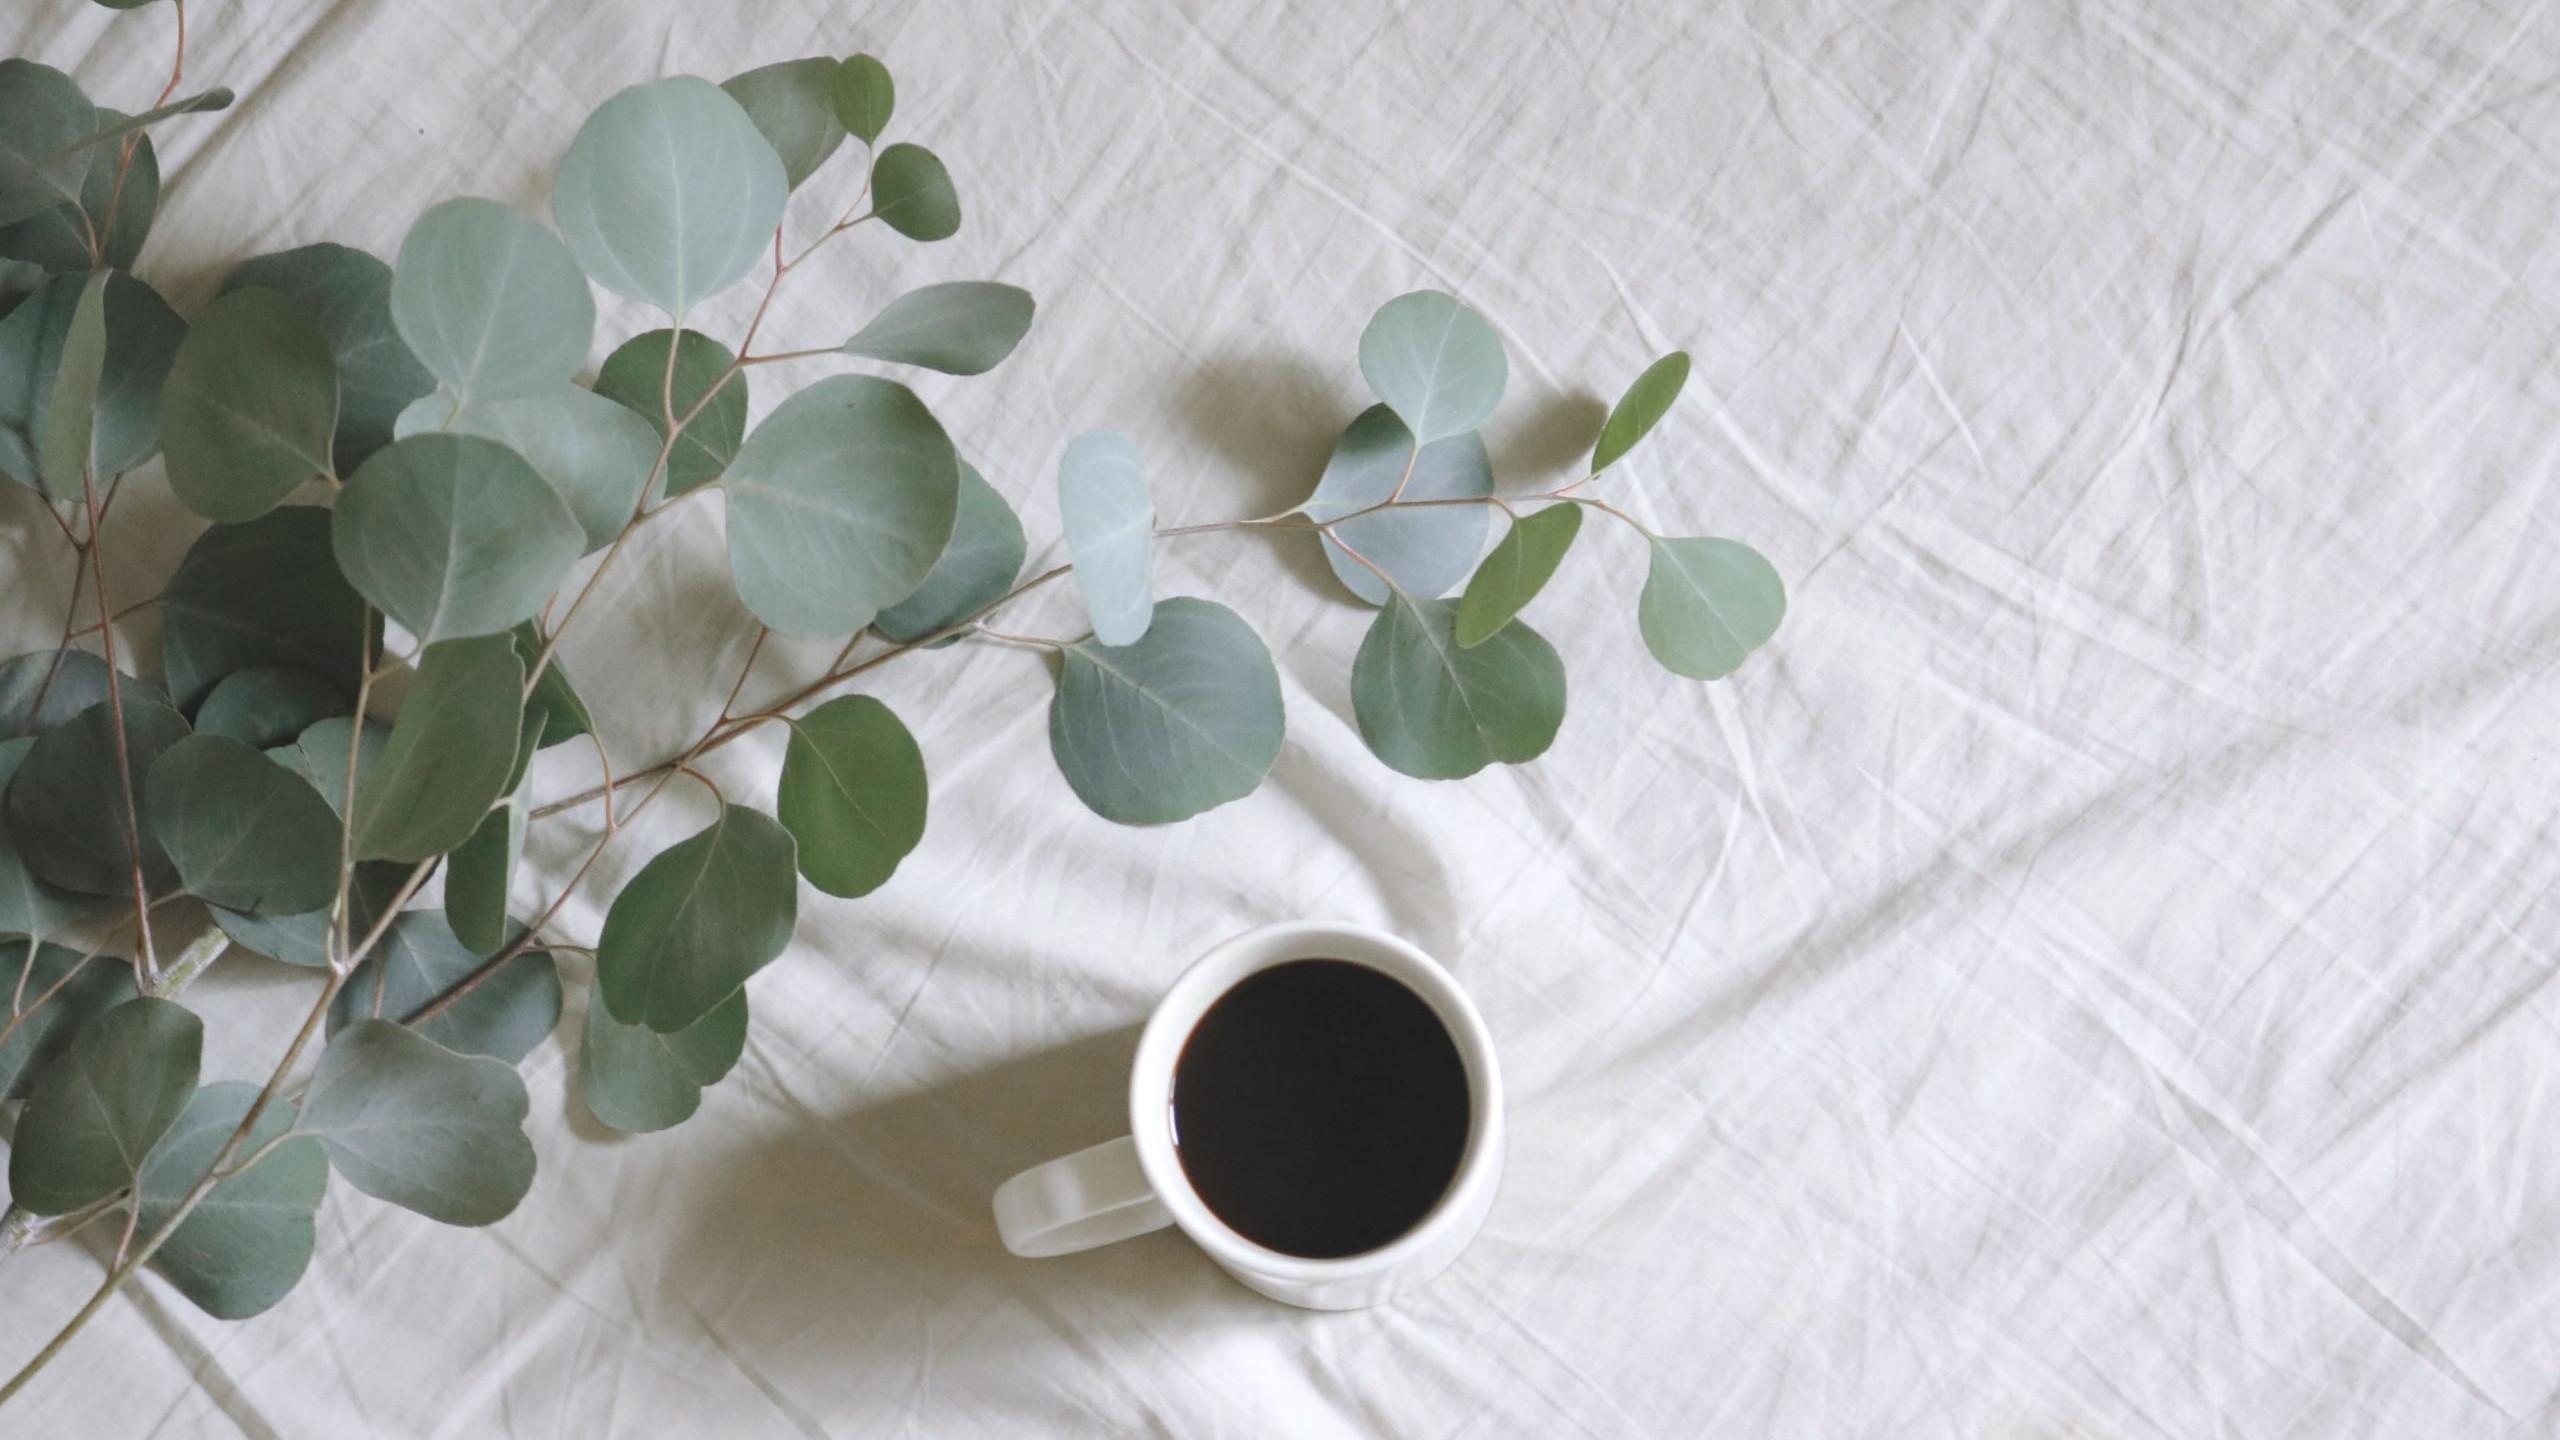 eucalyptus pain relief